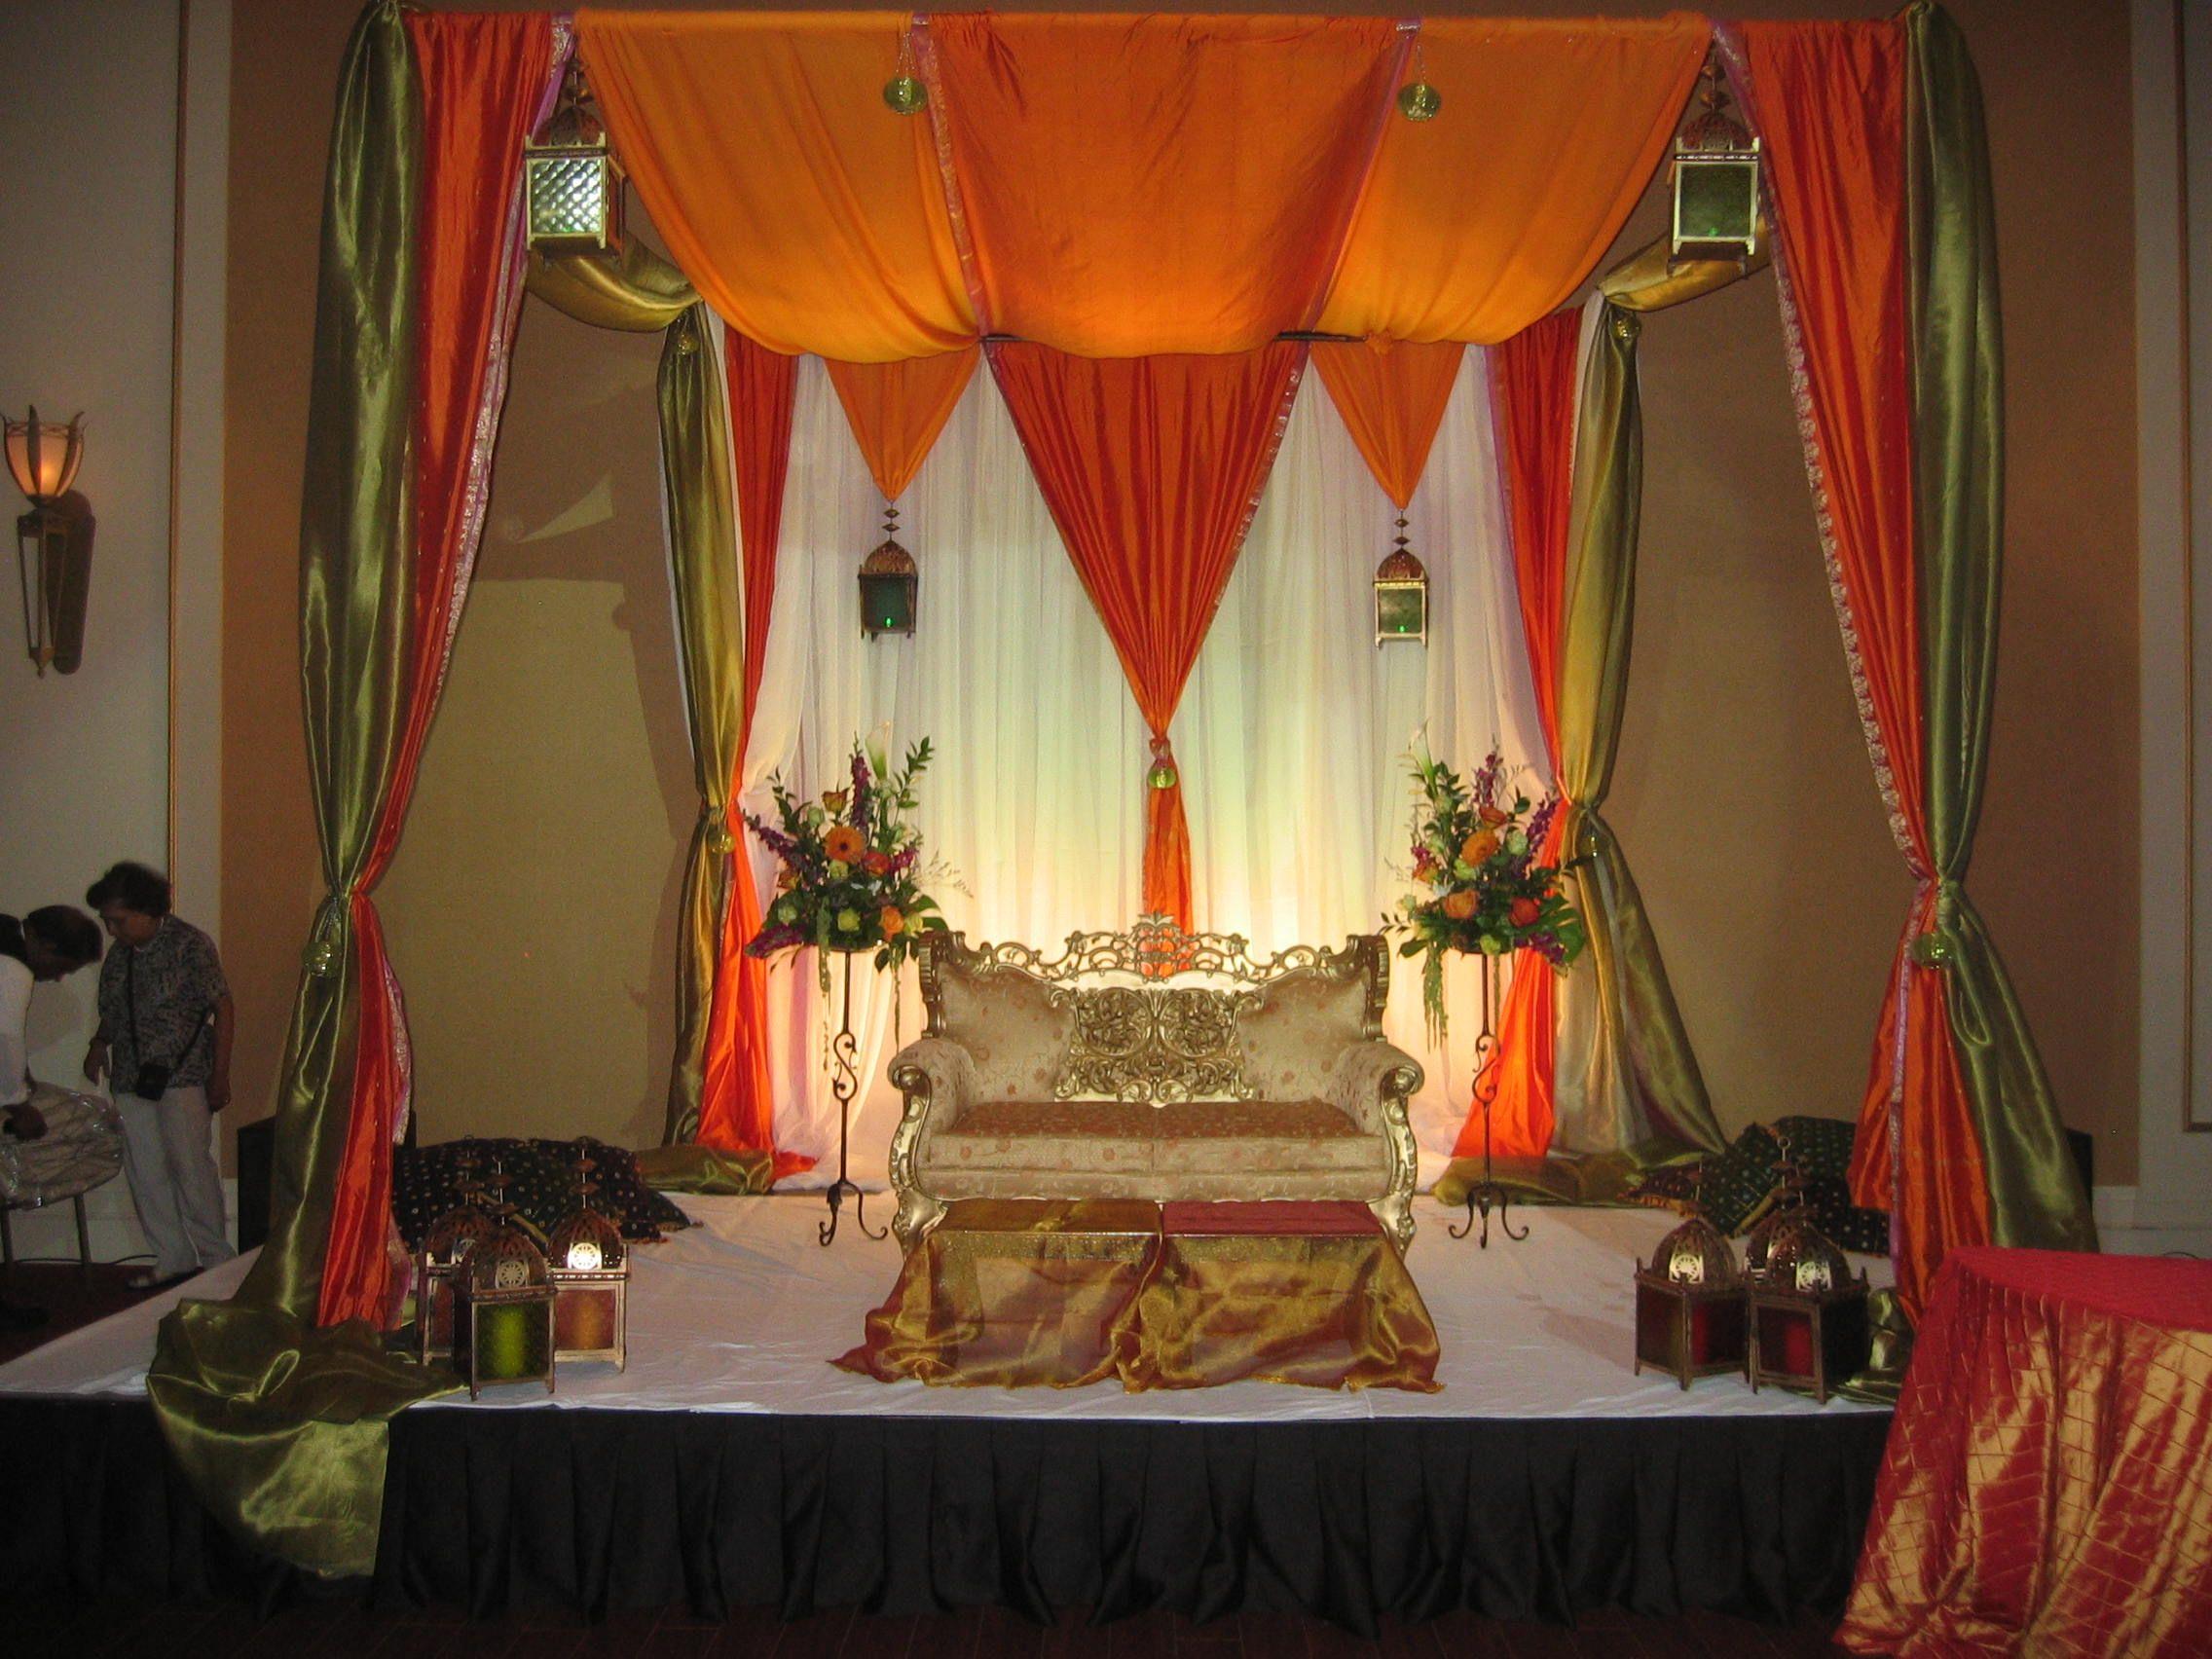 morrocan theme morrocan theme Toronto Indian